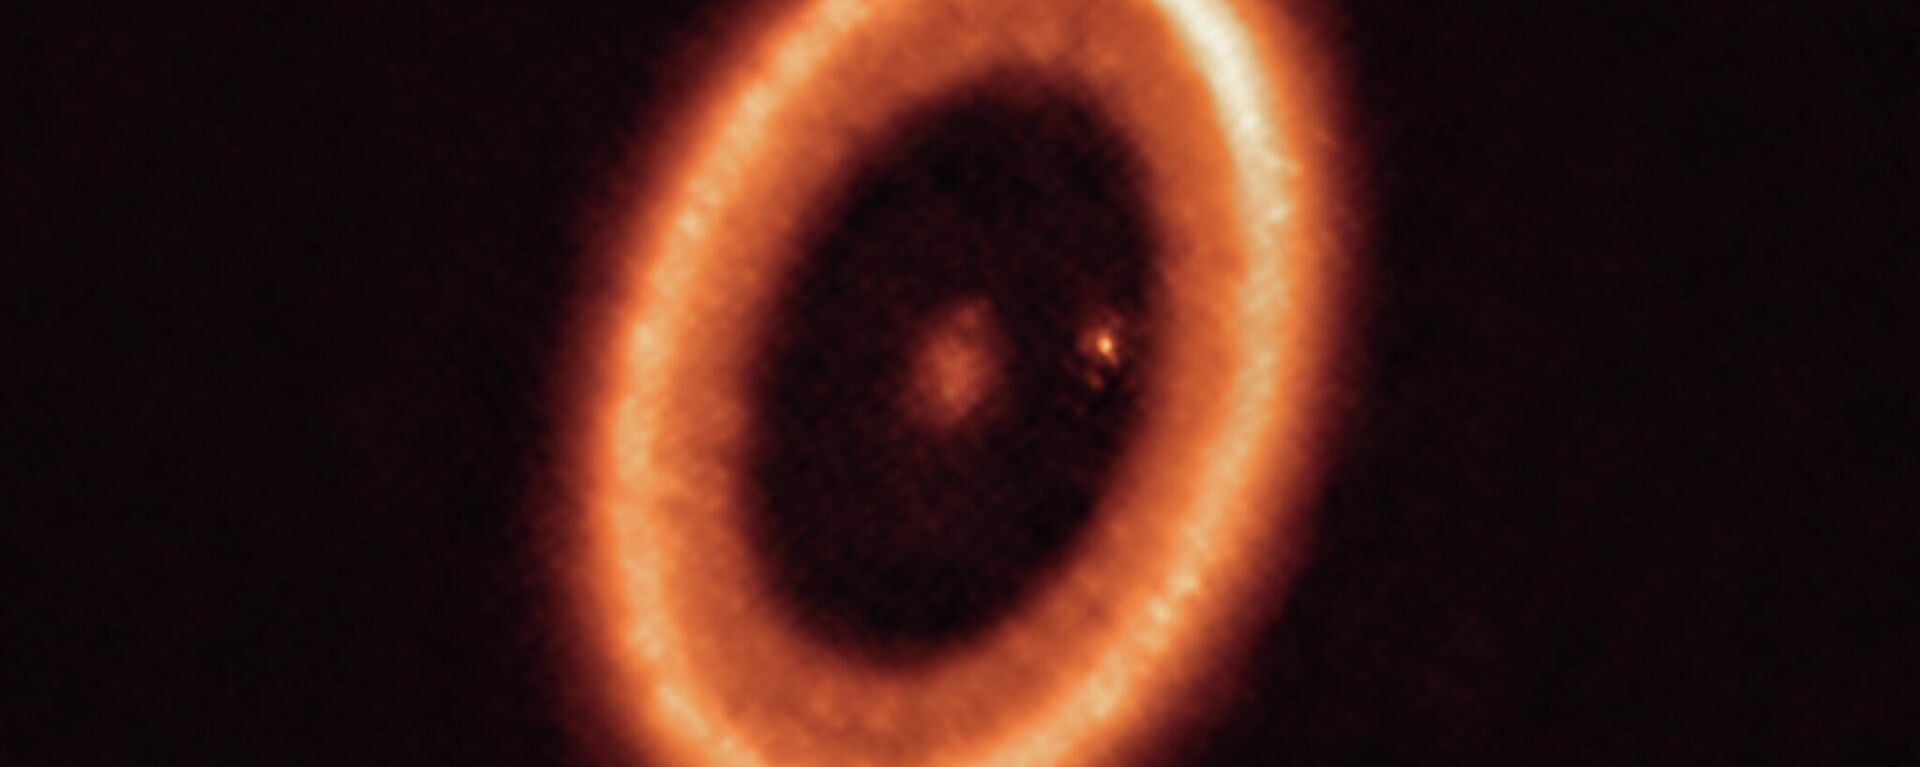 Detectan por primera vez un disco que crea lunas alrededor de un exoplaneta - Sputnik Mundo, 1920, 23.07.2021